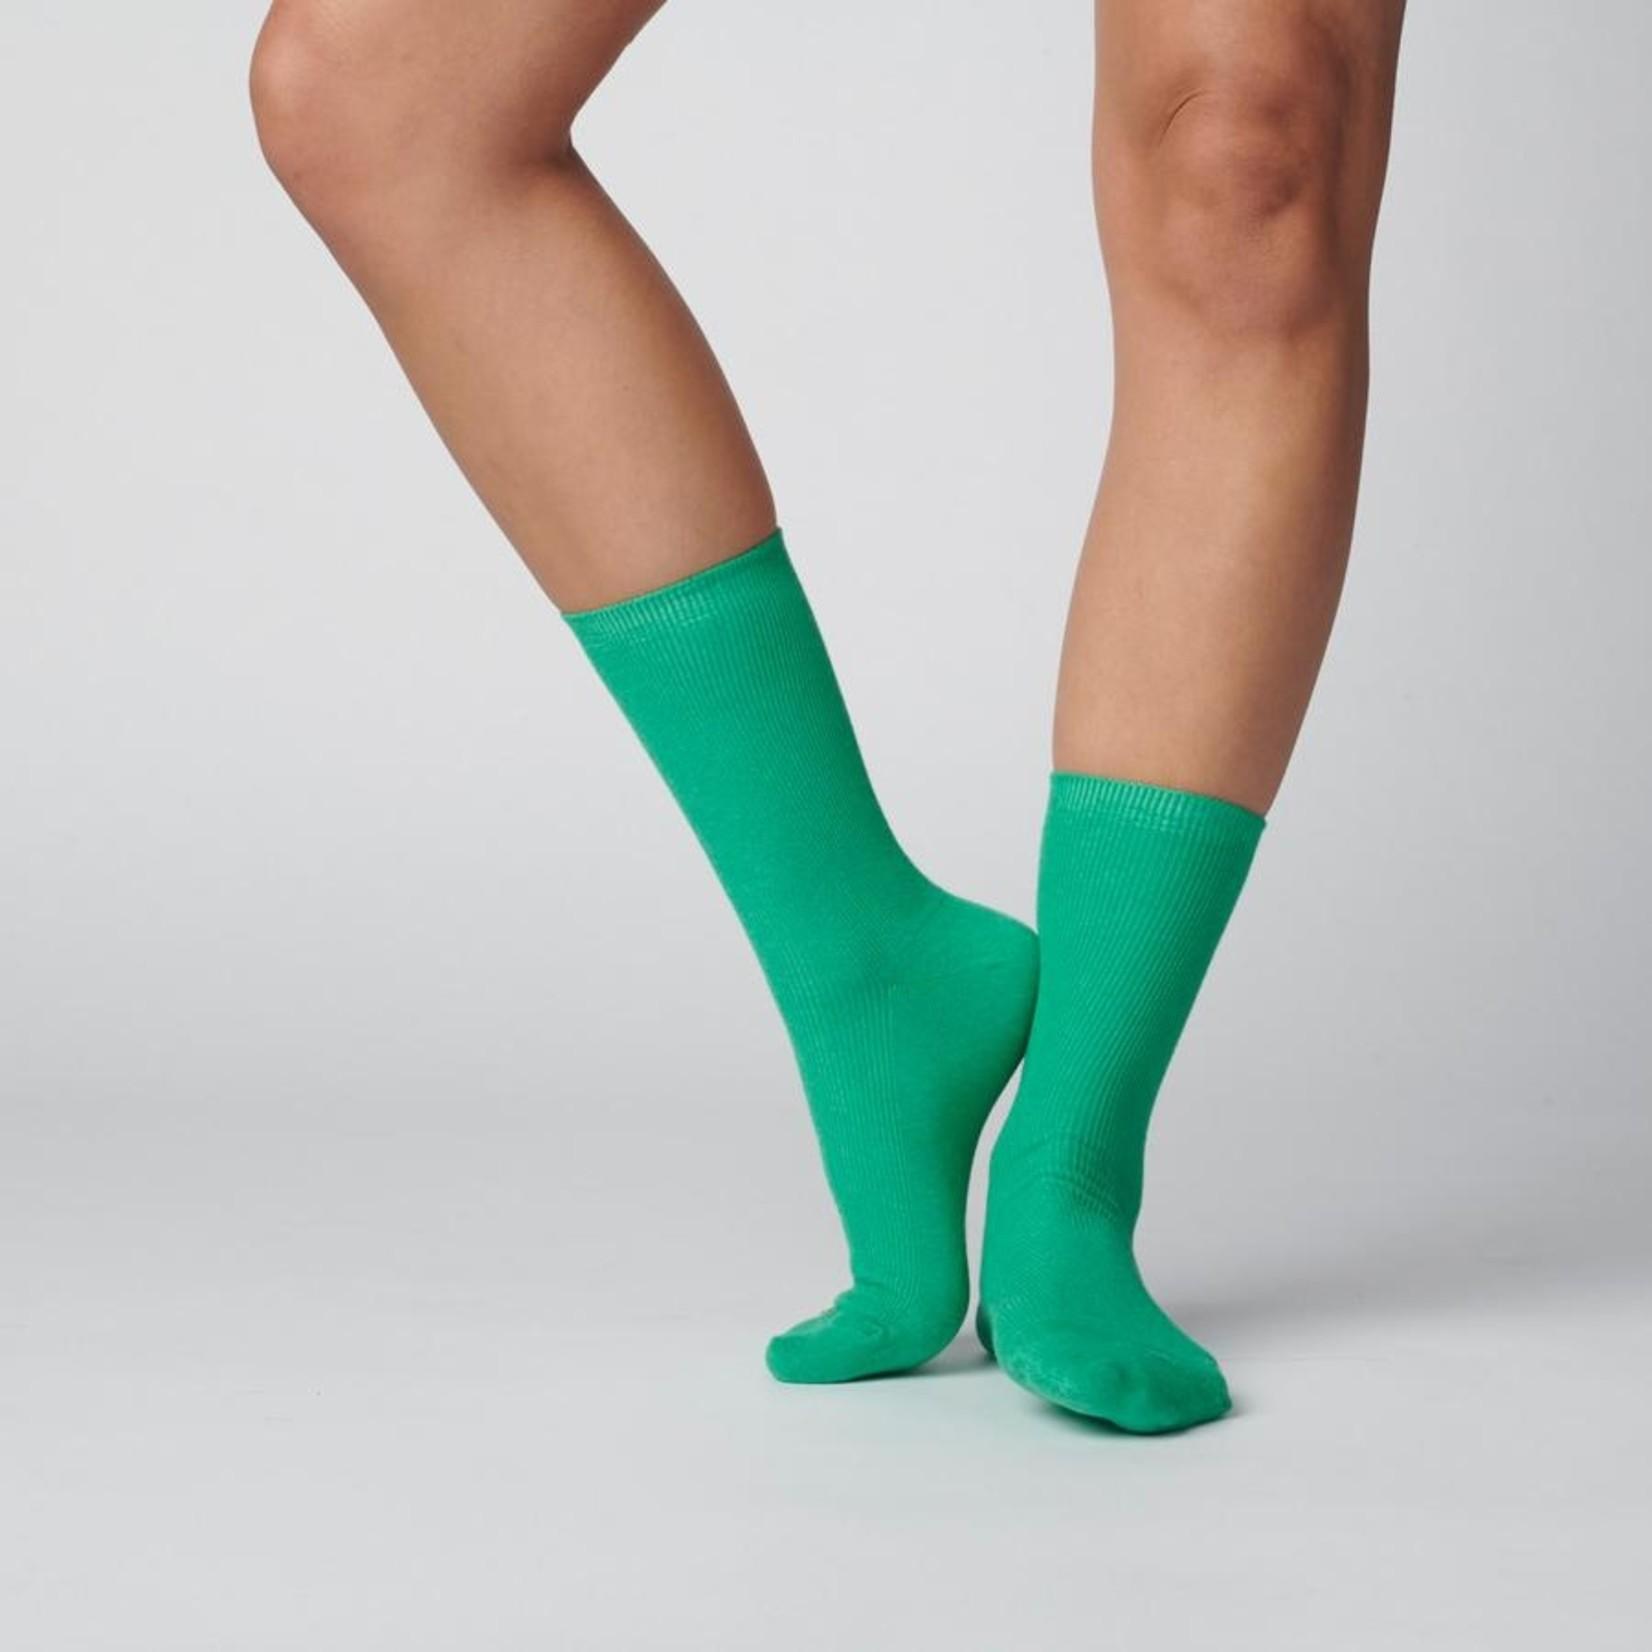 Hooray Sock Co. Everyday Cotton Socks Kelly Green